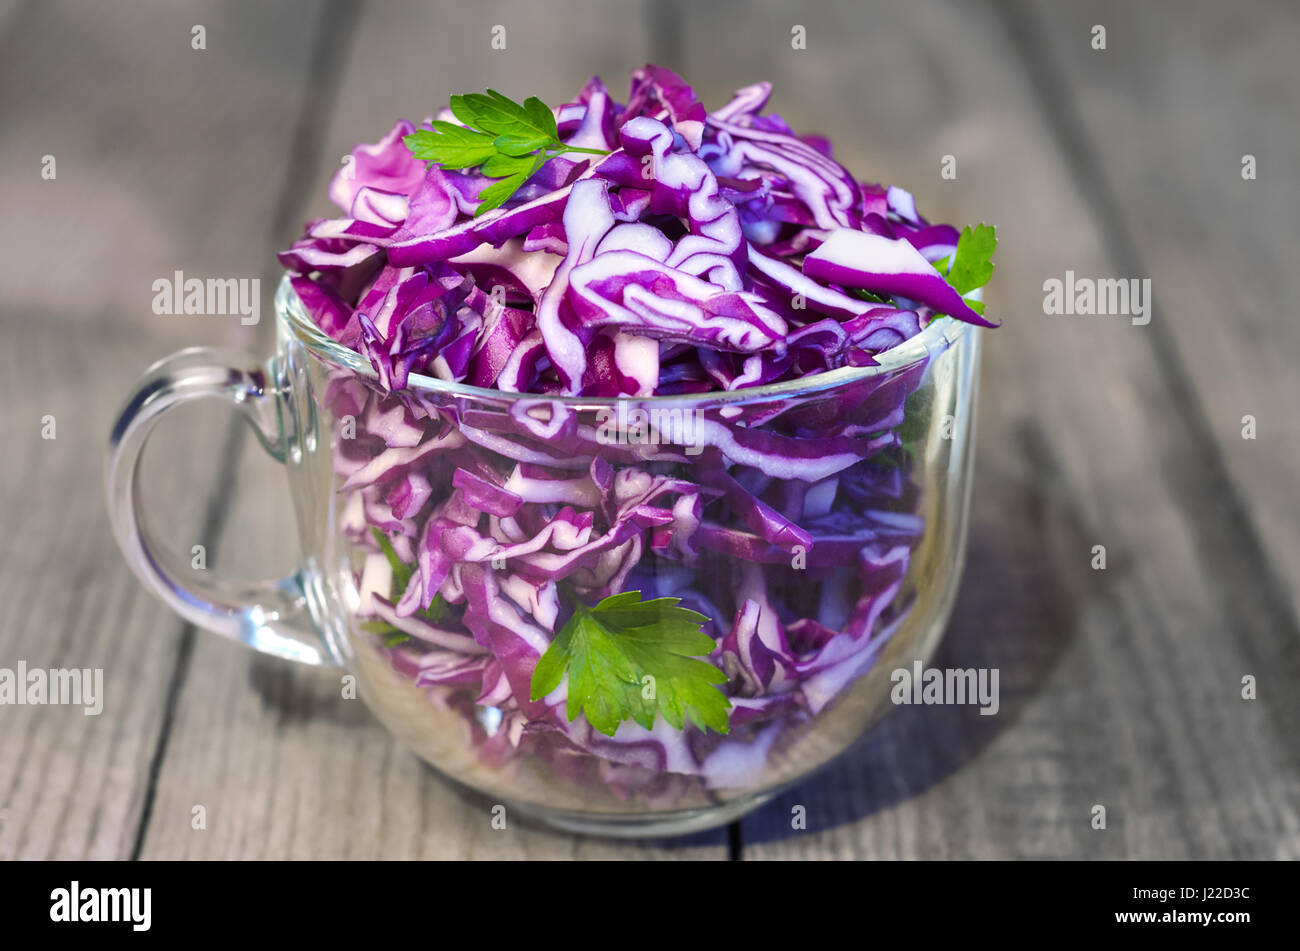 Salade de chou rouge. Background, selective focus Photo Stock